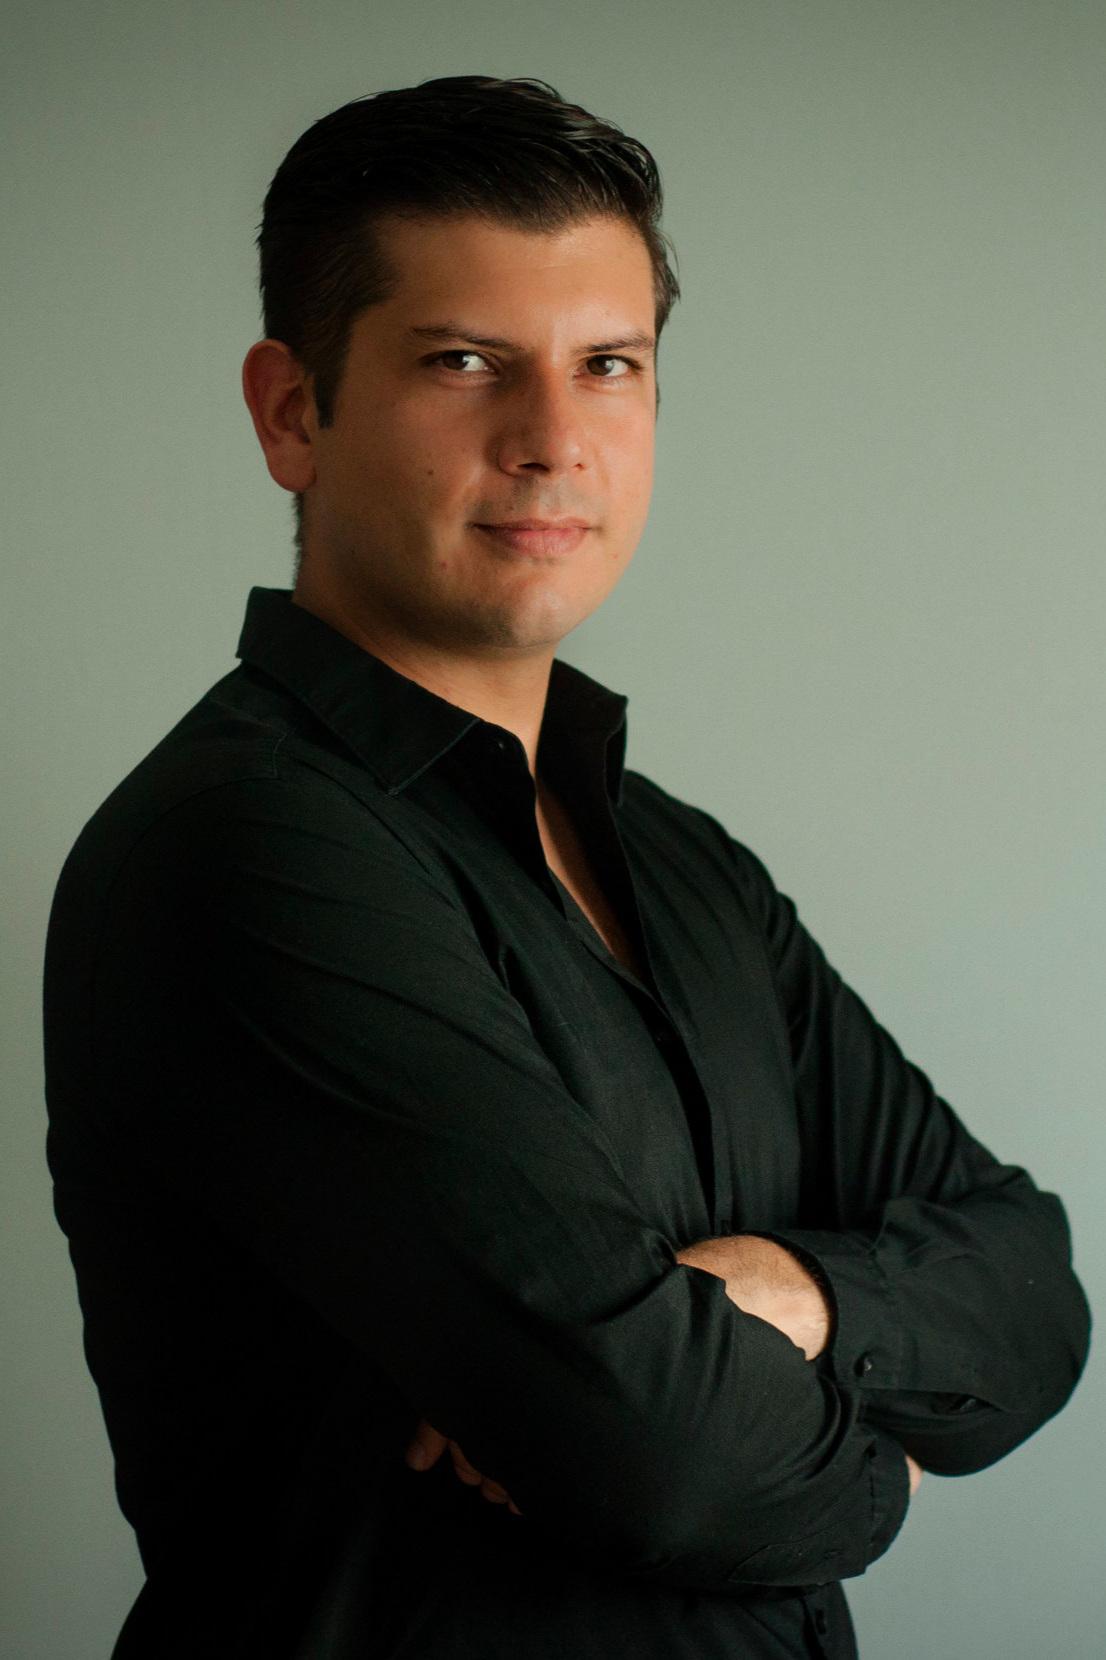 Felipe Luksic - English spoken Real Estate Advisor / Españolfelipe@selvacorealty.com